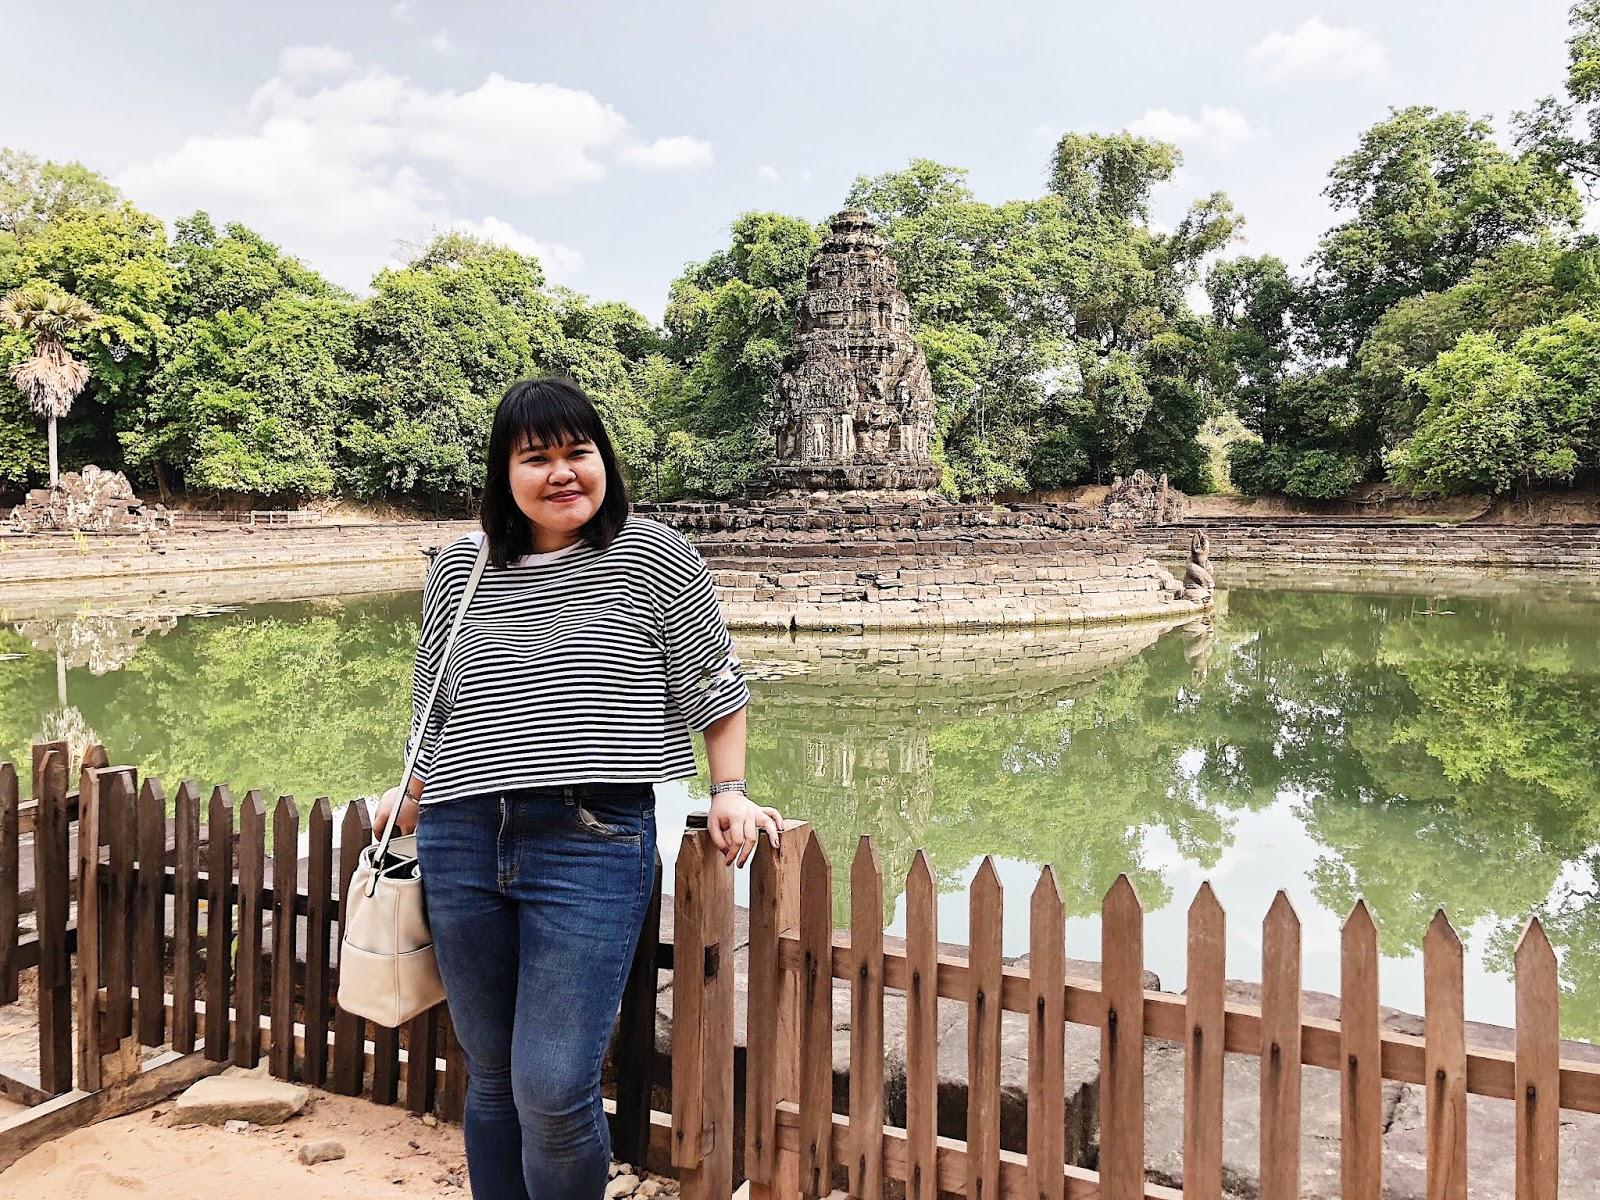 Ton posing inside Neak Pean